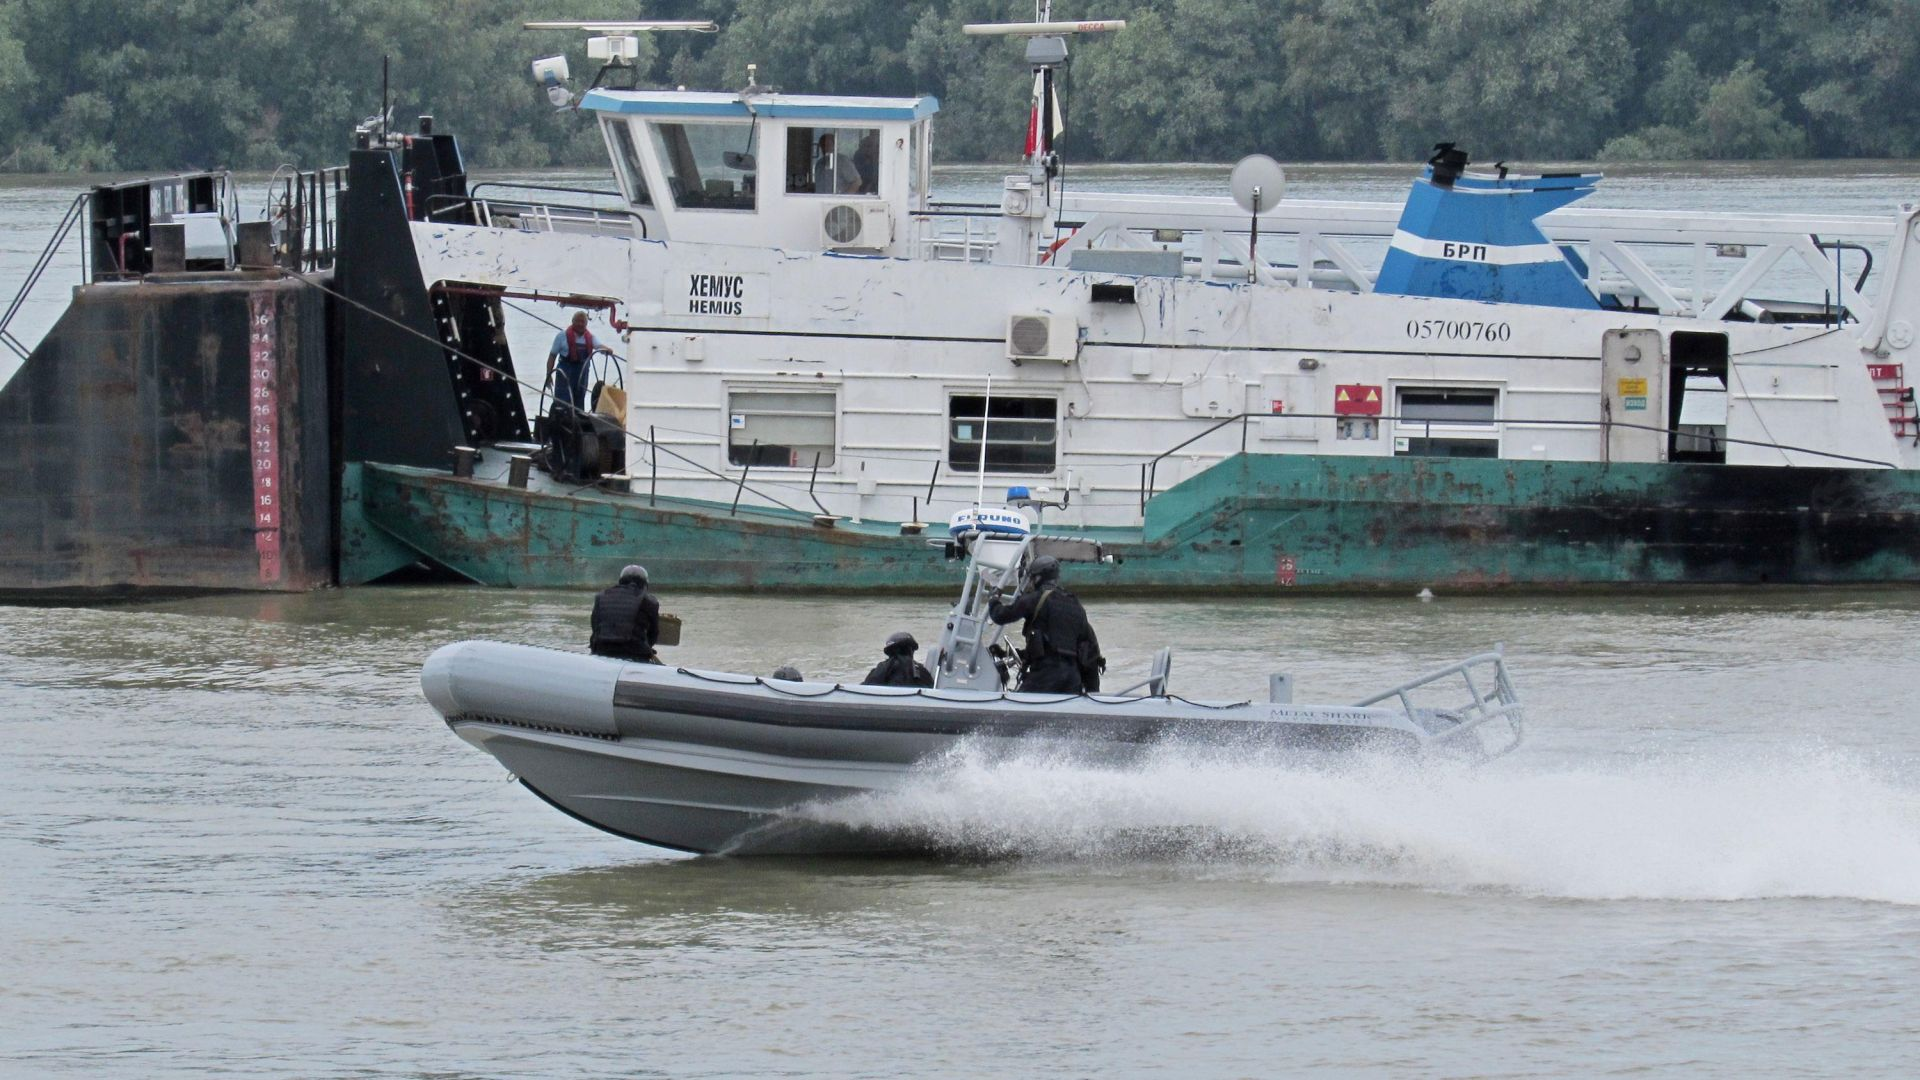 Учение:  Спецчасти обезвредиха завзет от терористи шлеп в Дунав